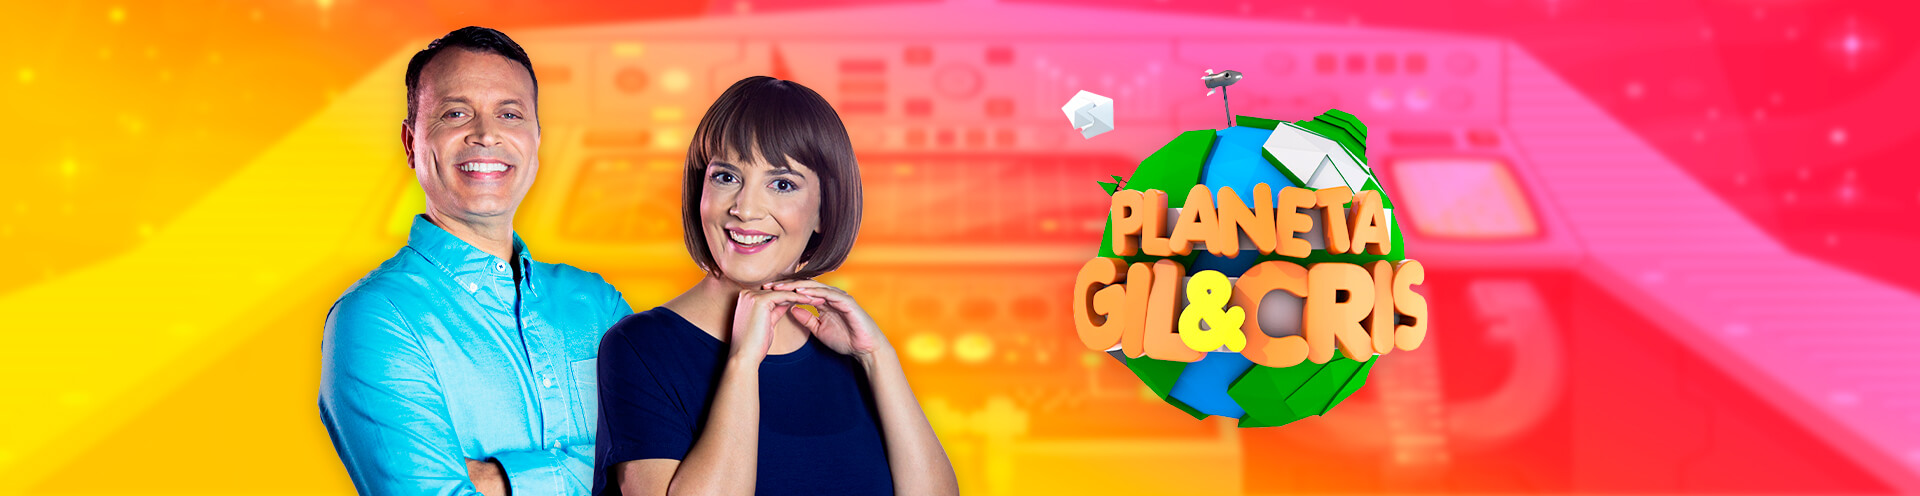 PLANETA GIL E CRIS - NT Play